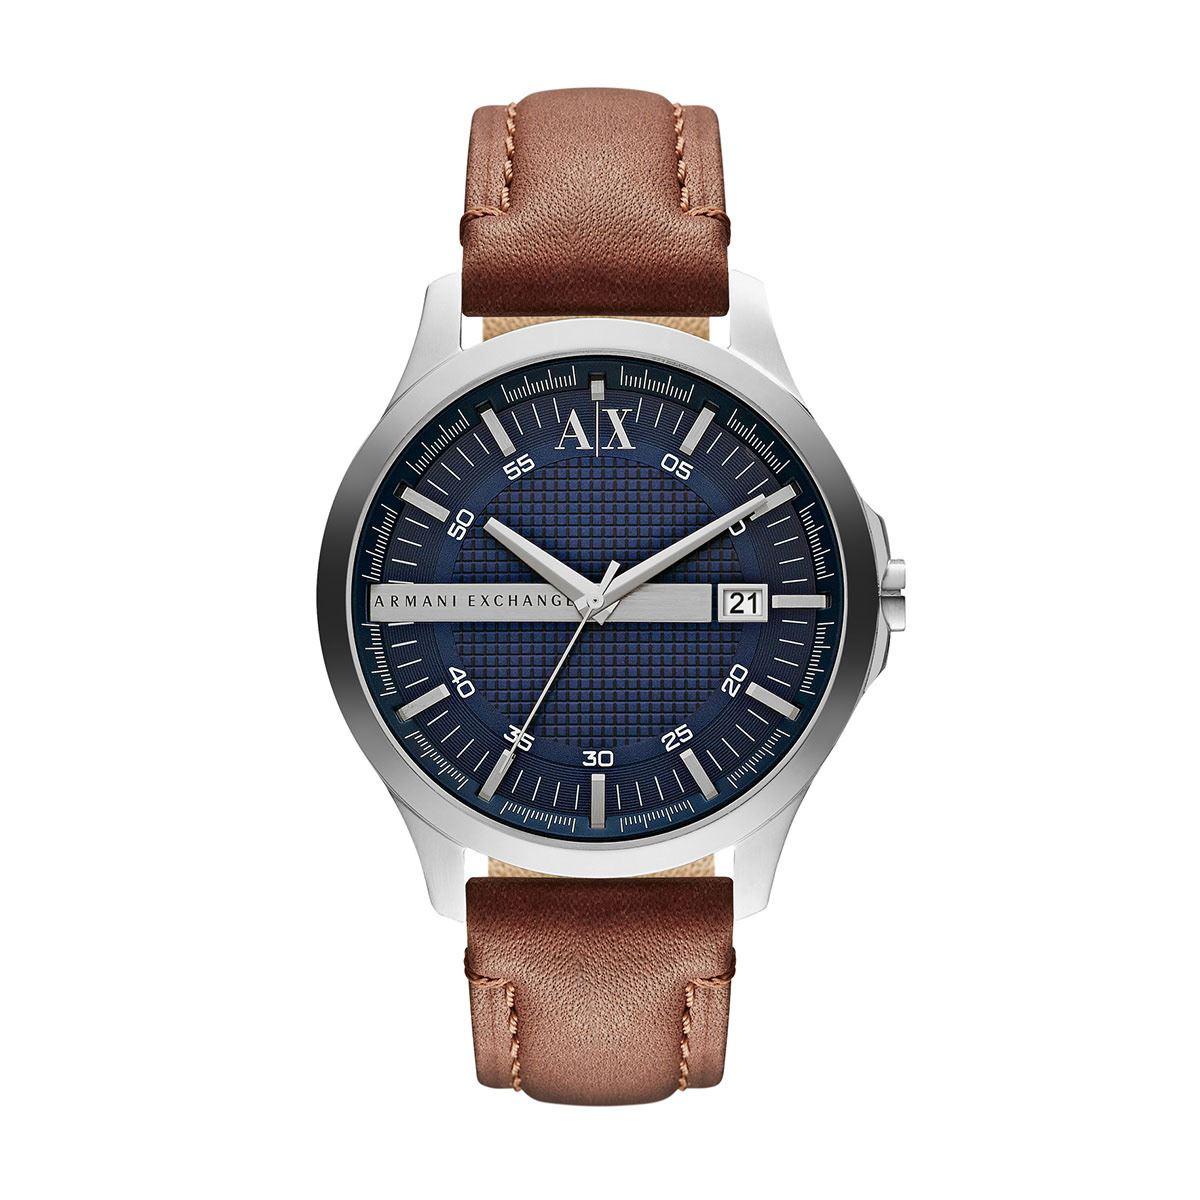 Reloj armani exchange ax2133  - Sanborns